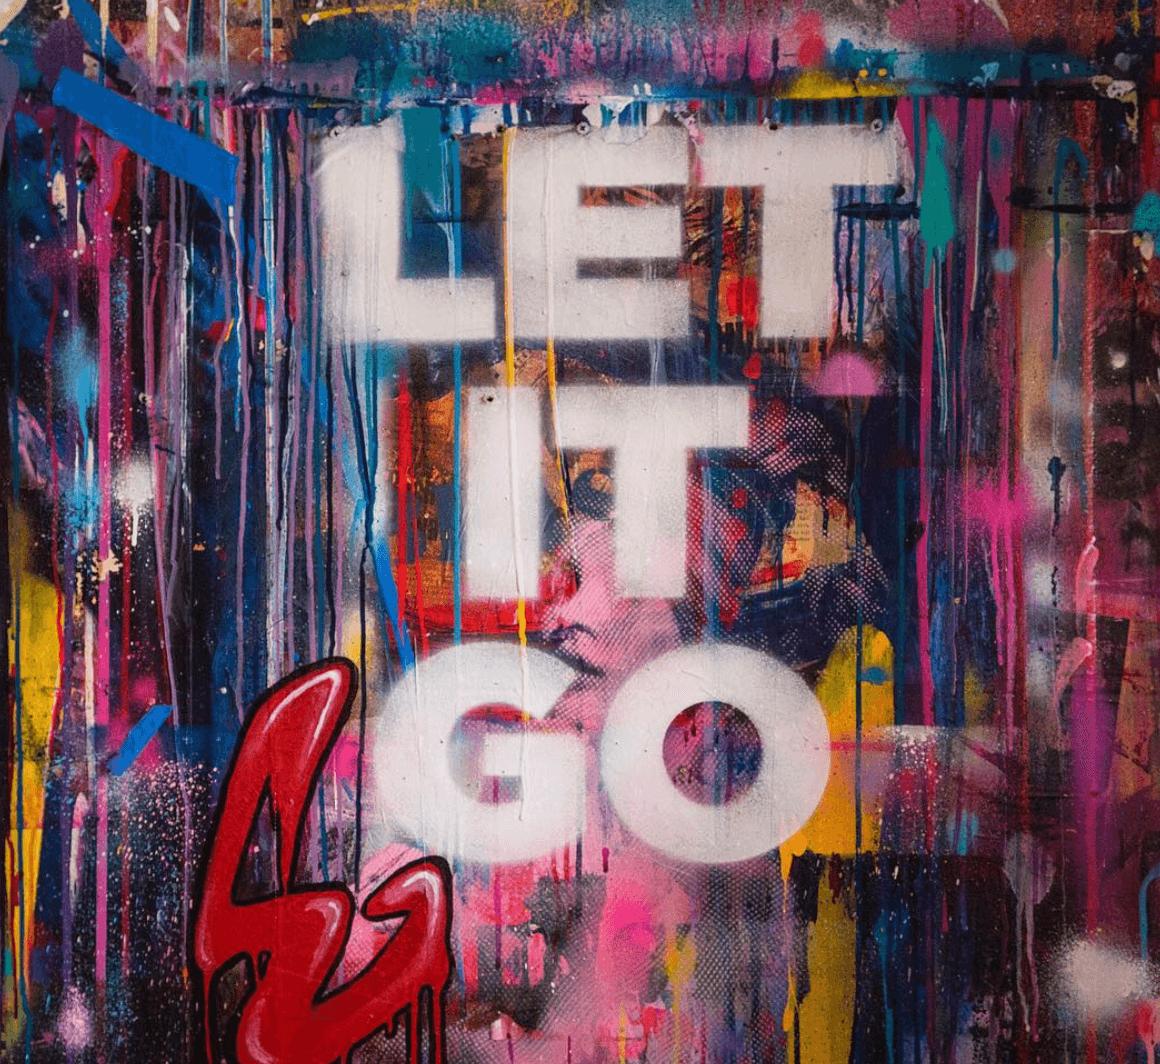 Let it Go by Jeremy Penn